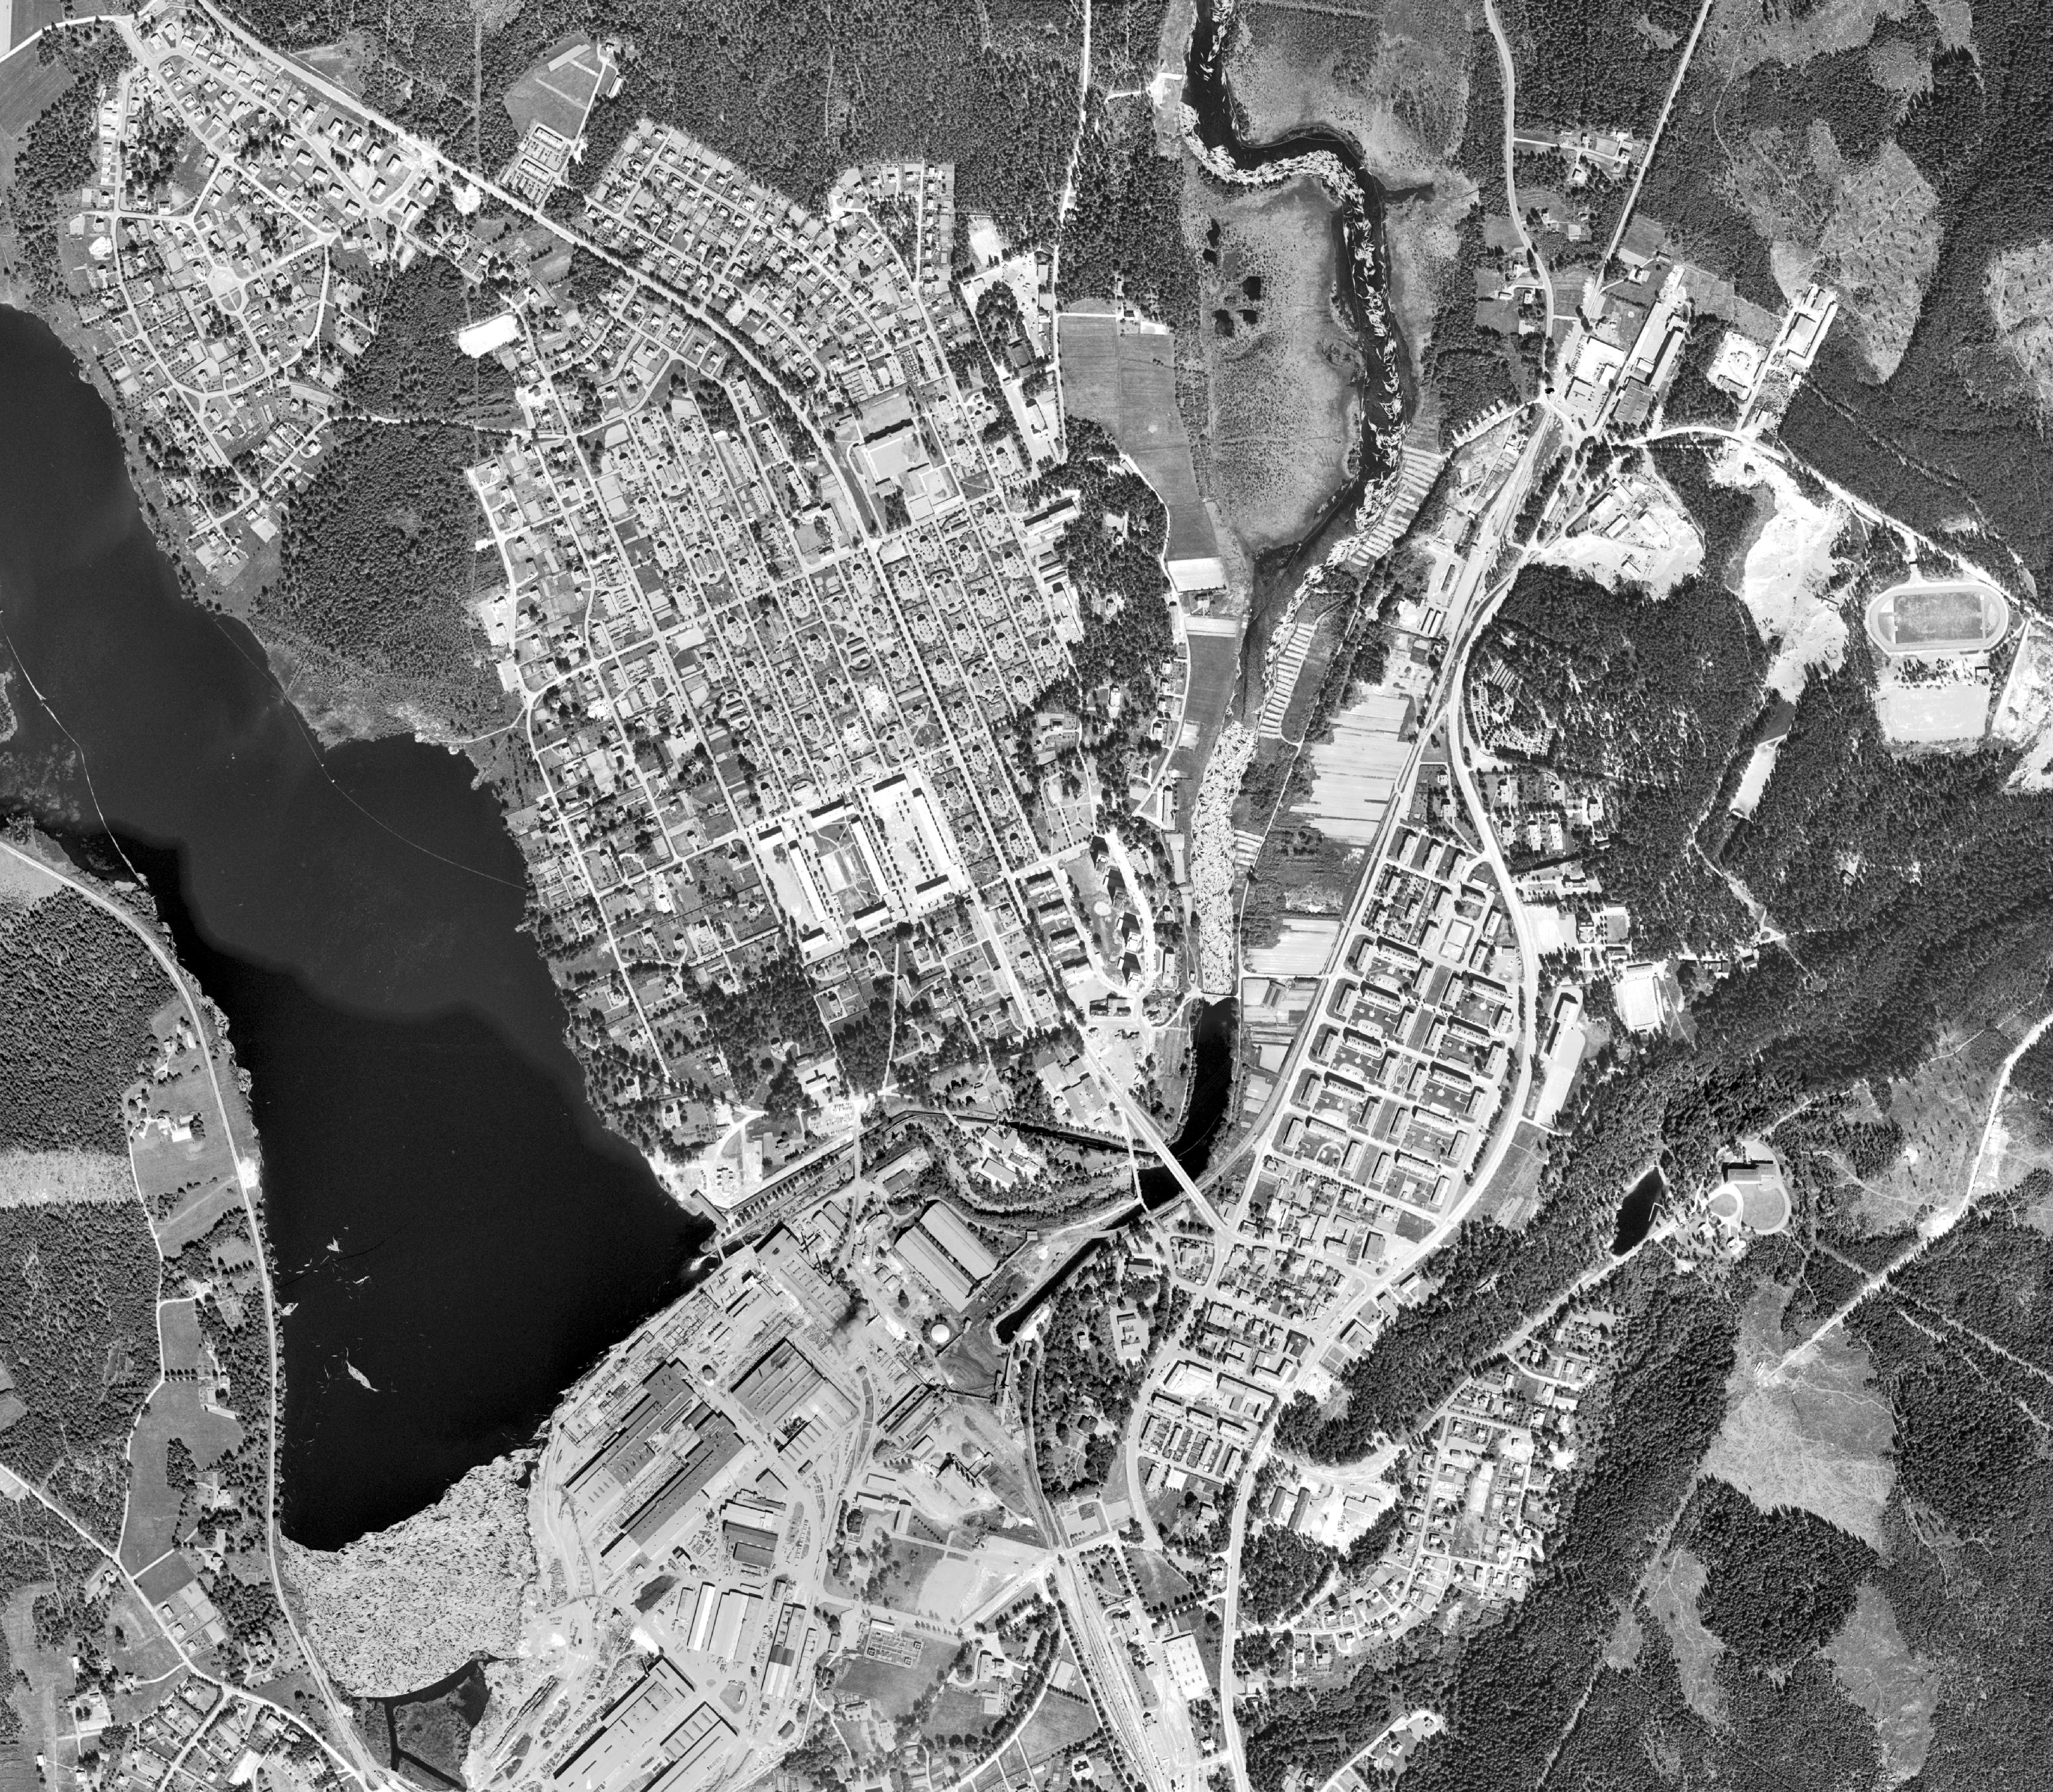 Re: [SWEDEN] What happens to Uddeholm, Norra Rda